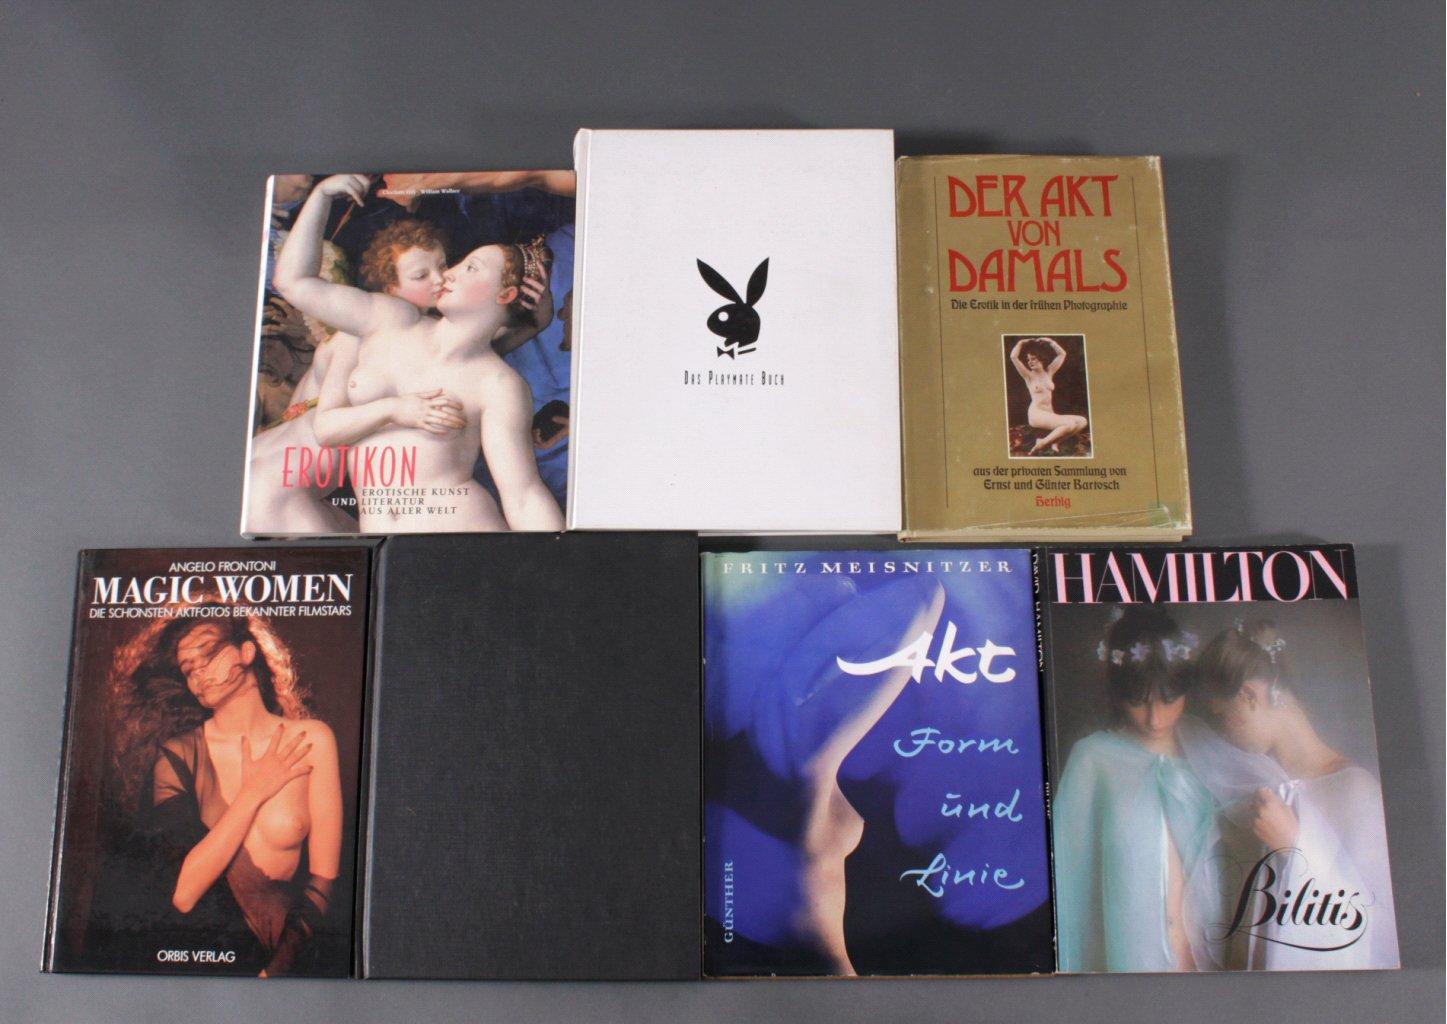 Konvolut Bücher zum Thema Erotik, 7 Stück